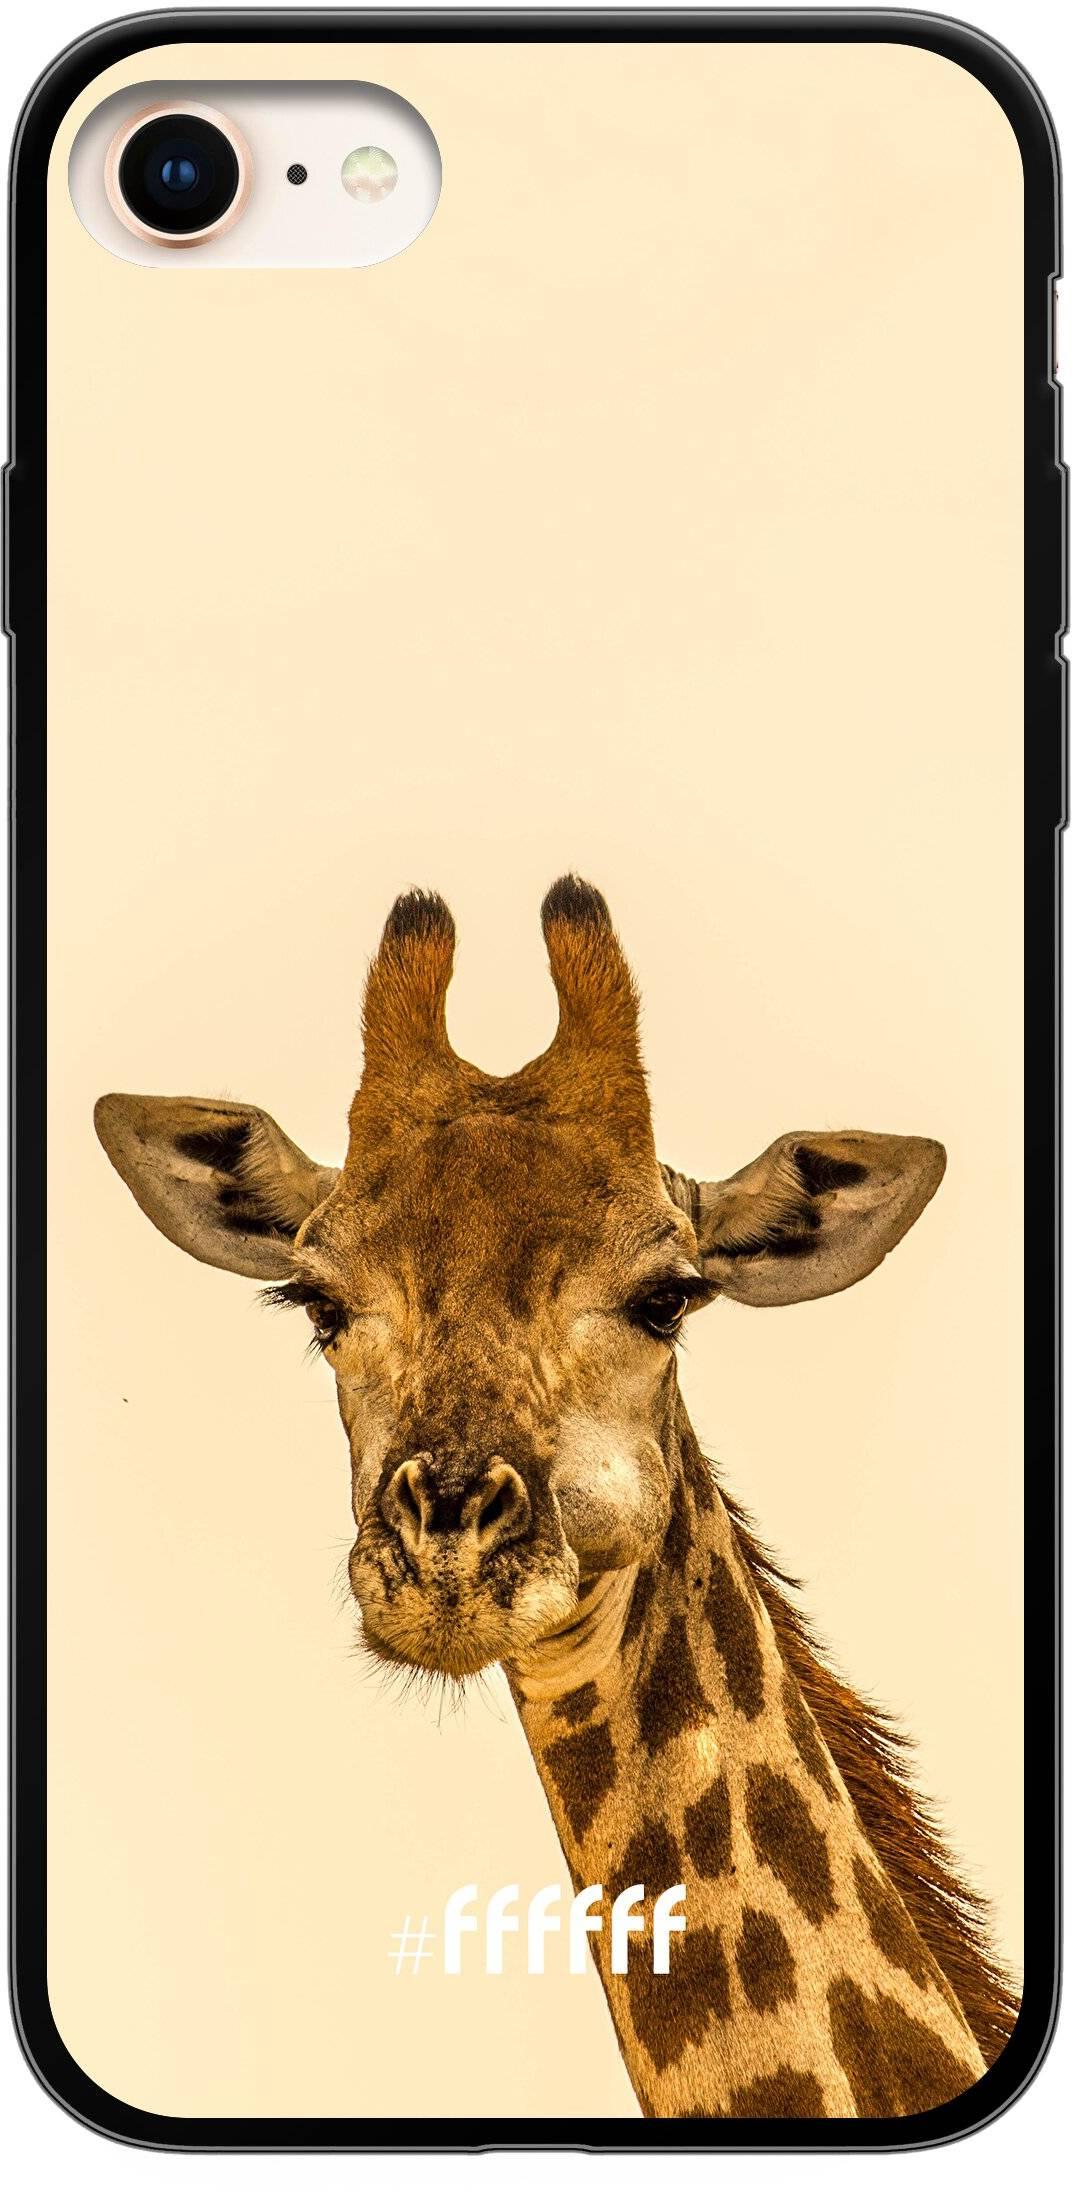 Giraffe iPhone 7